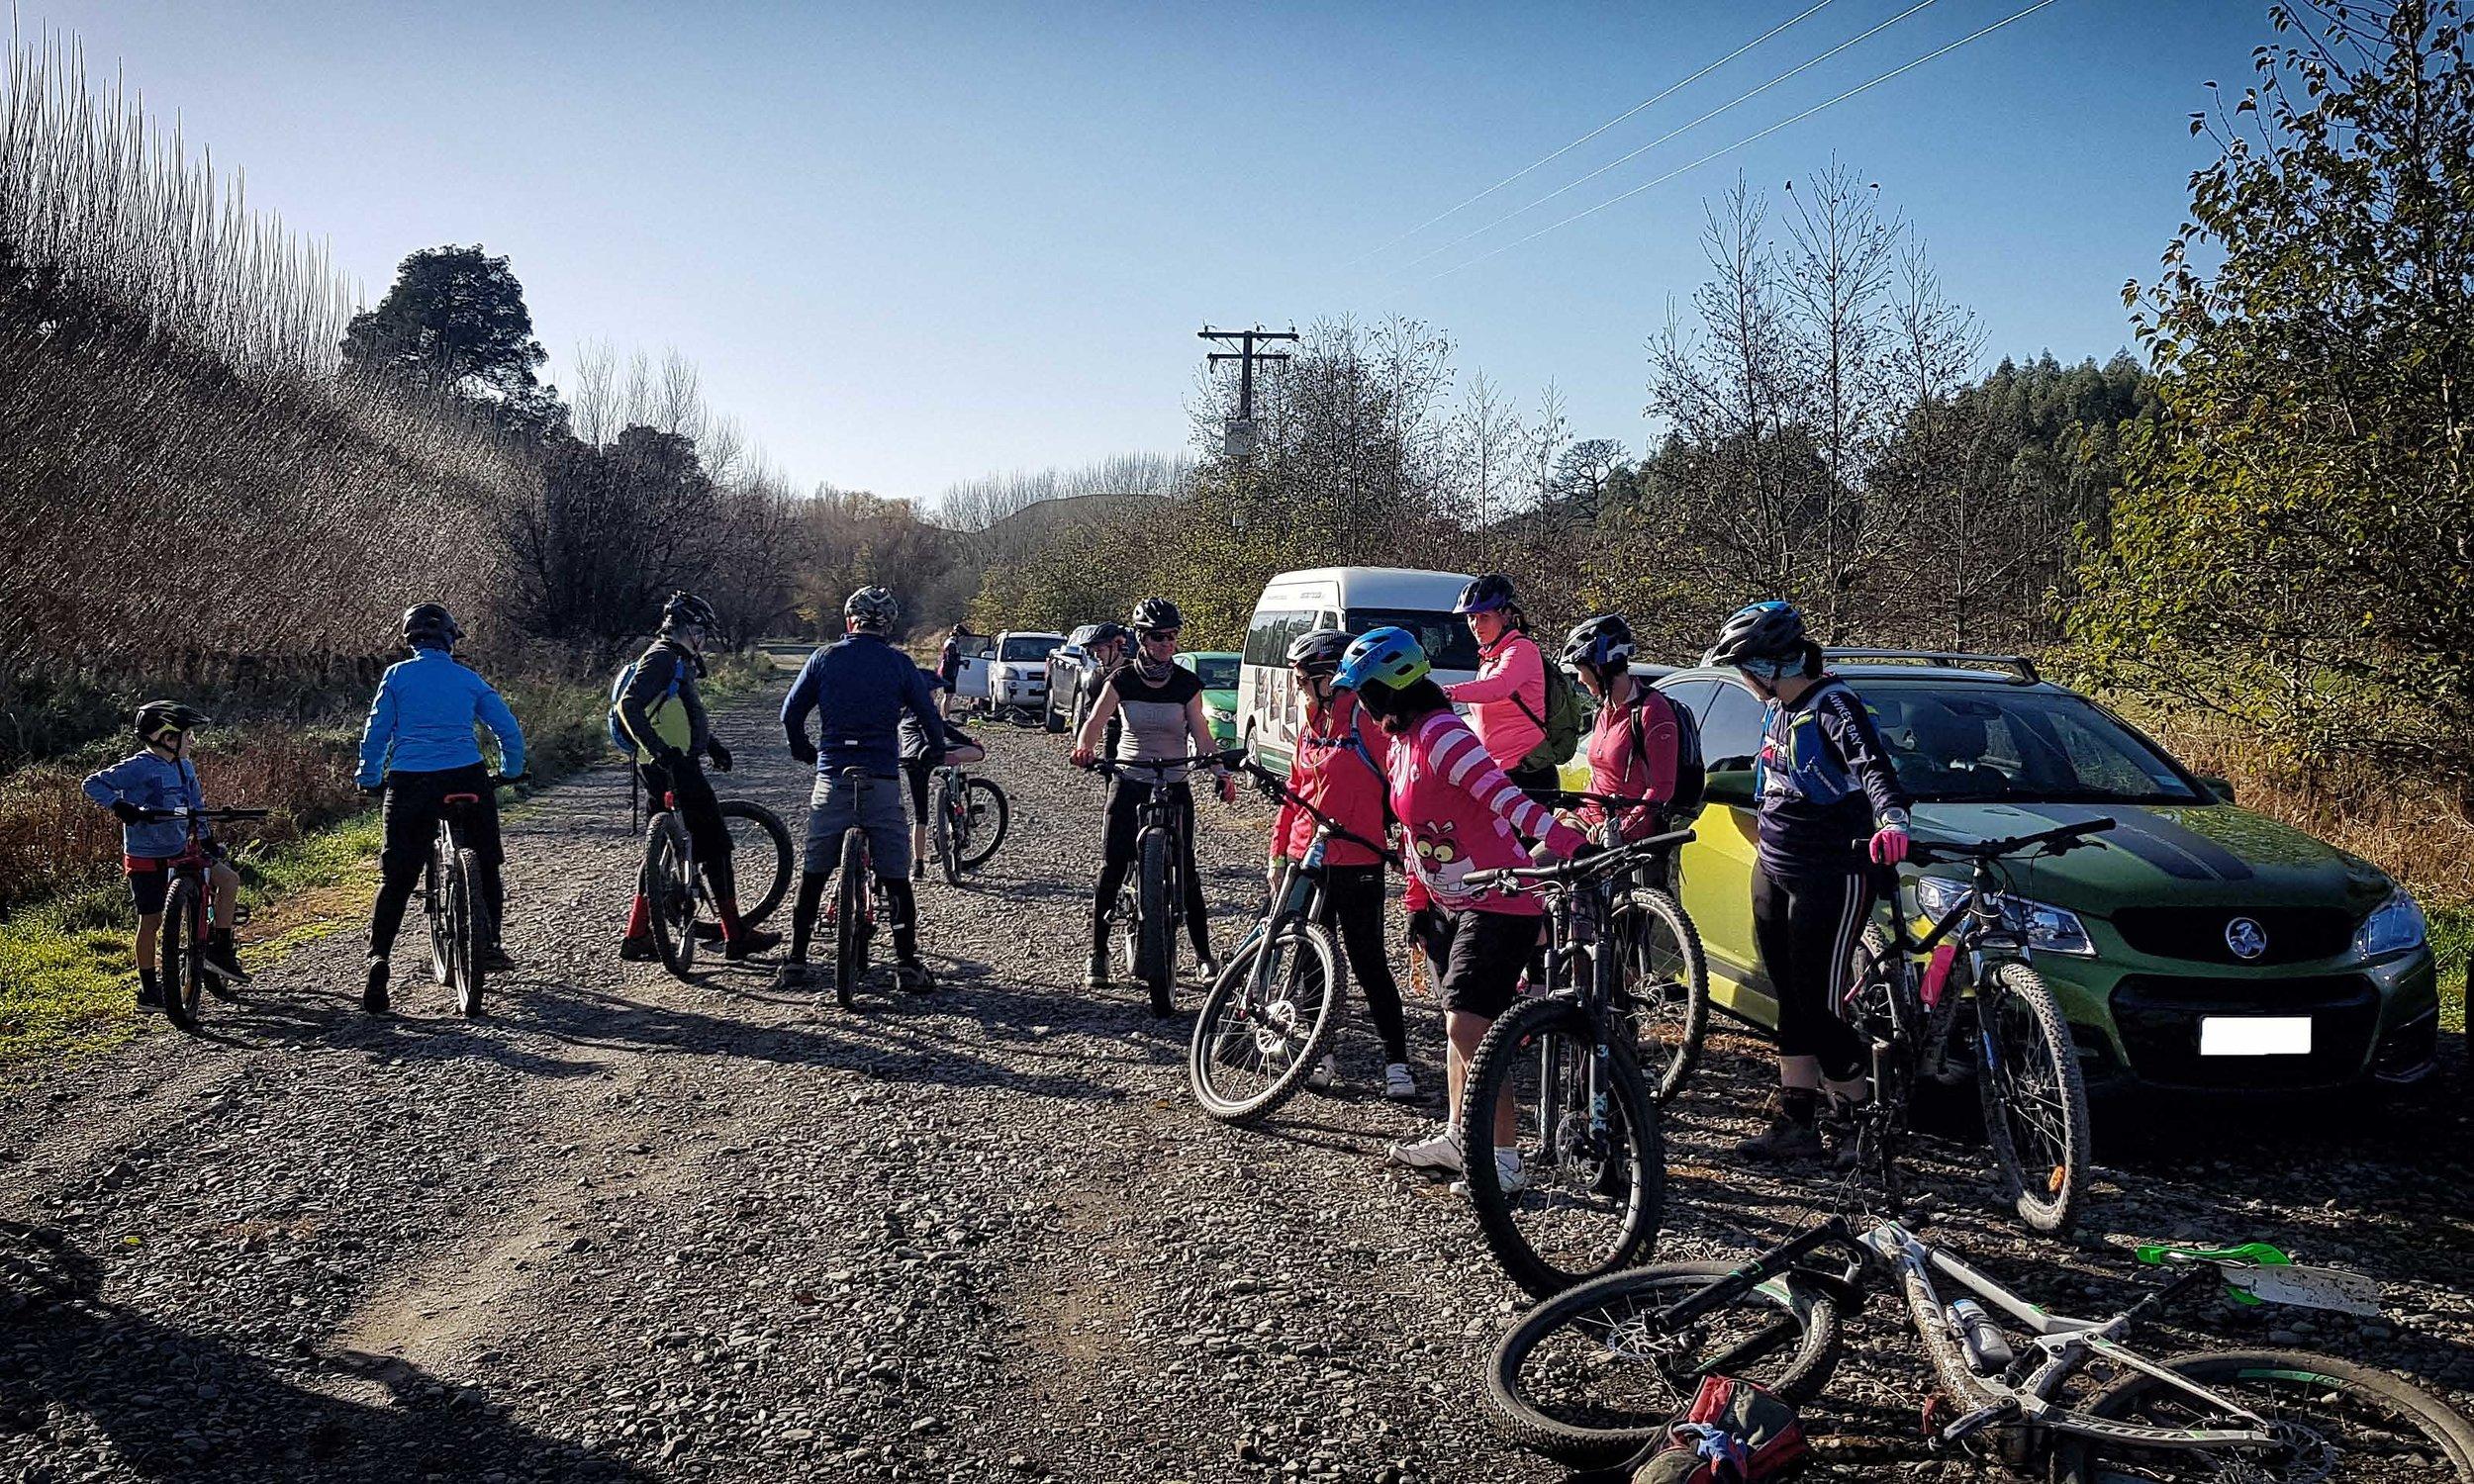 Hastings women's Mnb club at the Gum Tree Mountain Bike Park